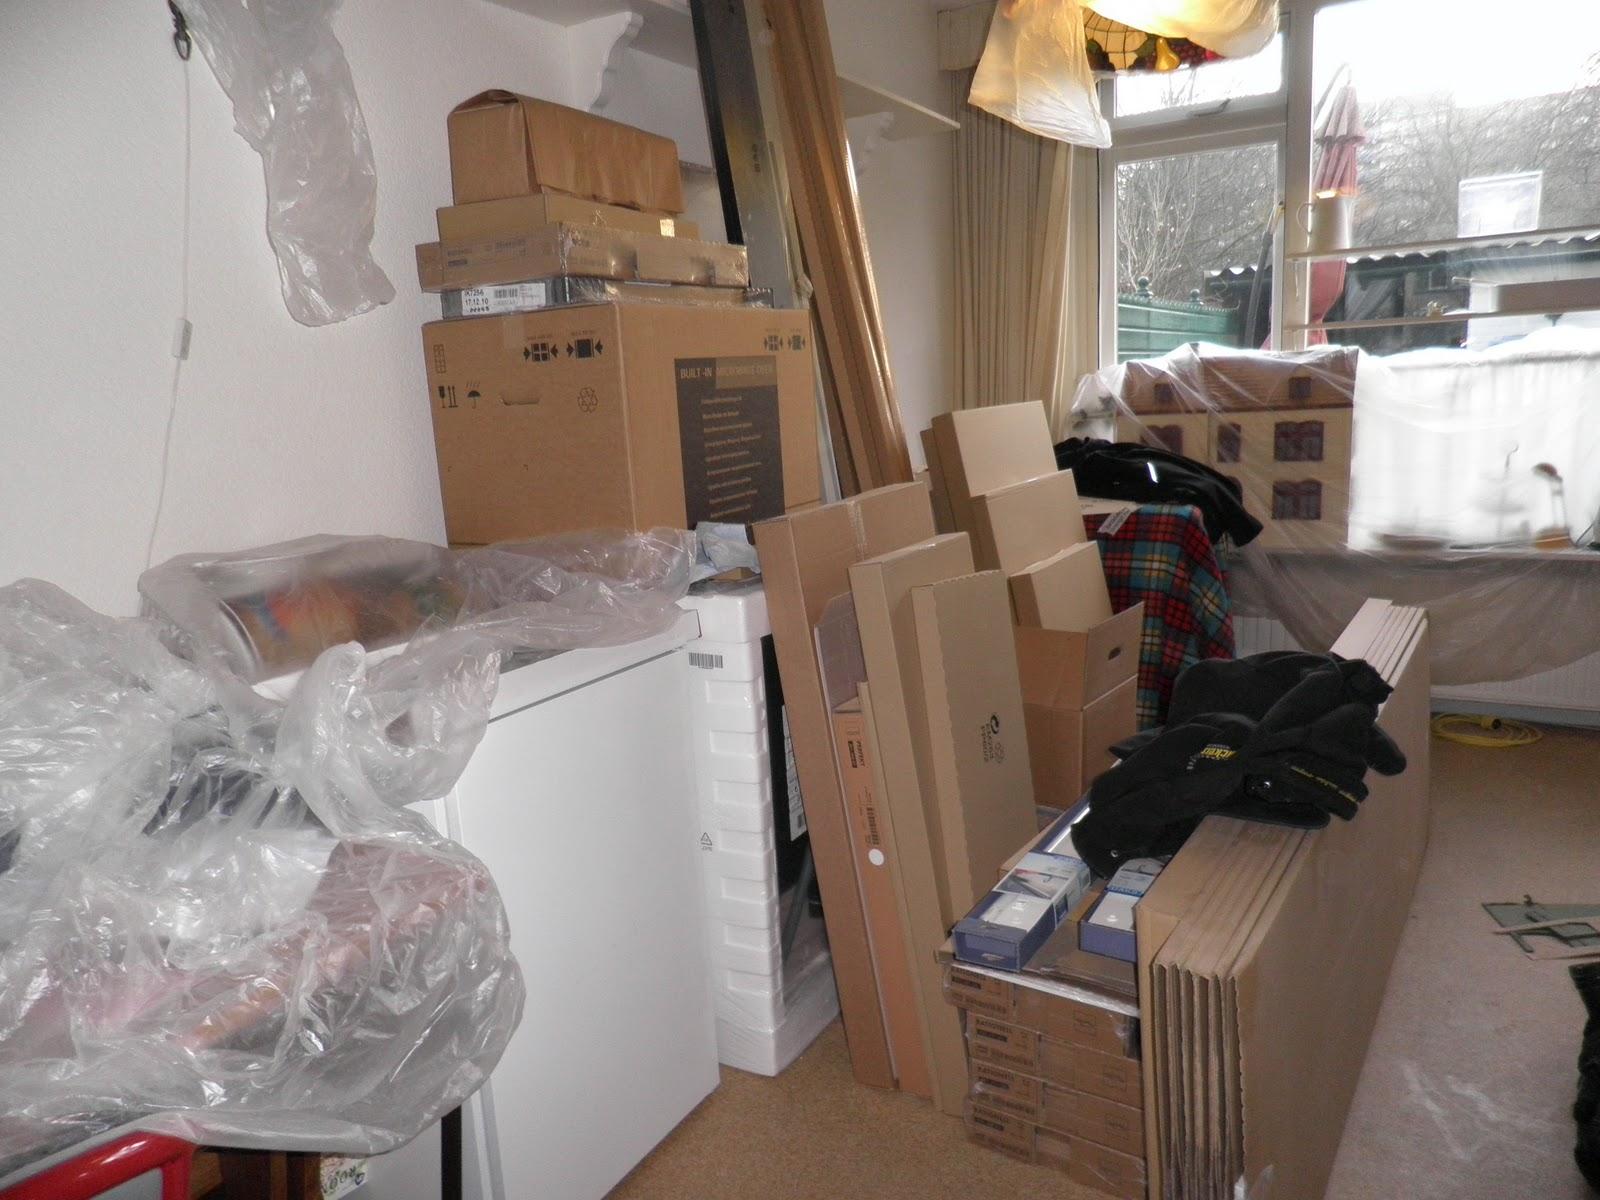 Bolusjes huis en honden: januari 2011